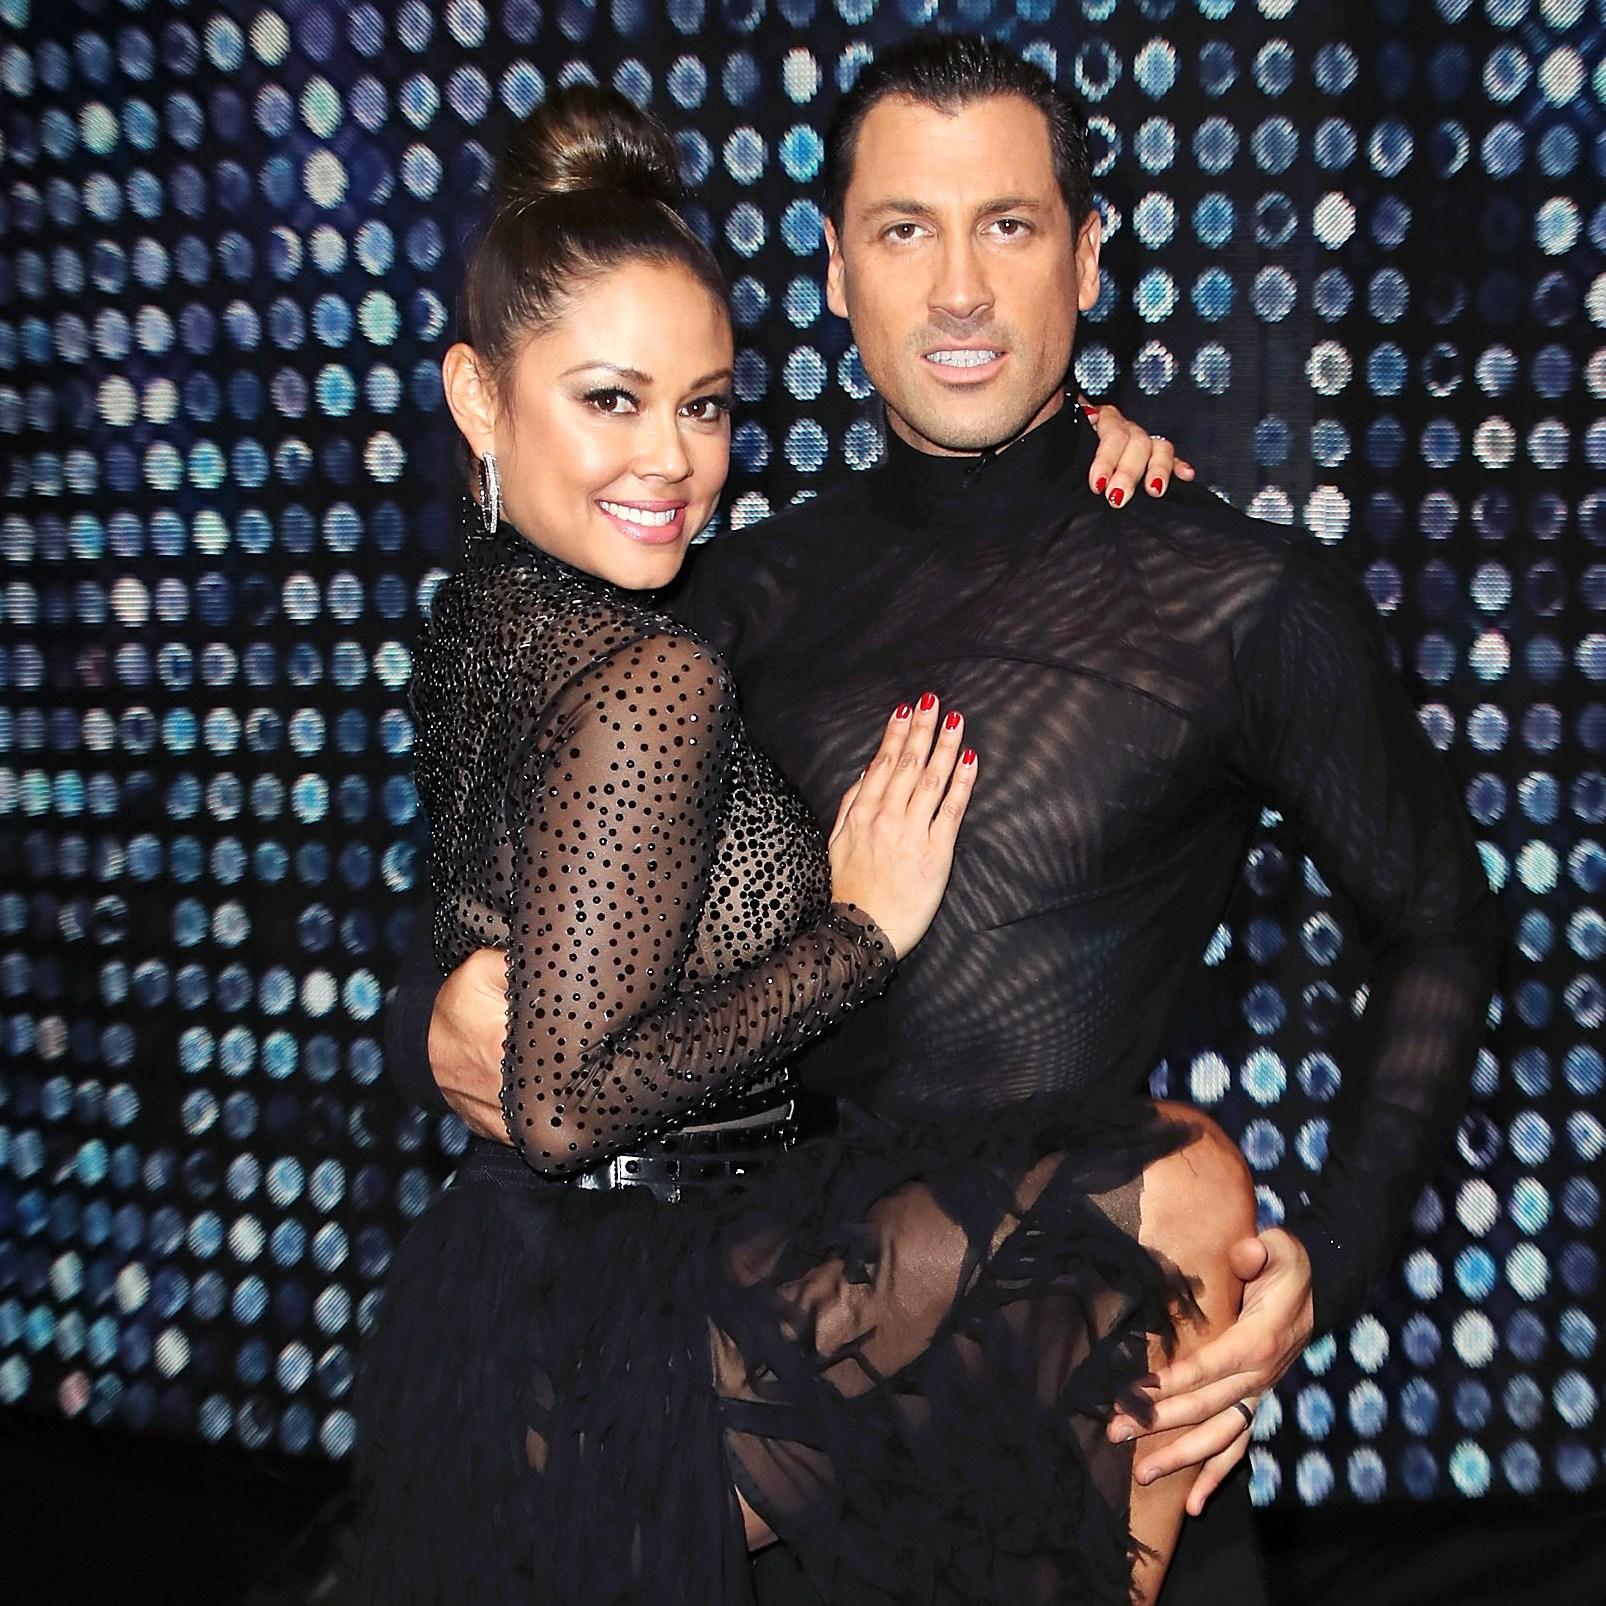 Vanessa Lachey Maksim Chmerkovskiy Dancing With The Stars DWTS